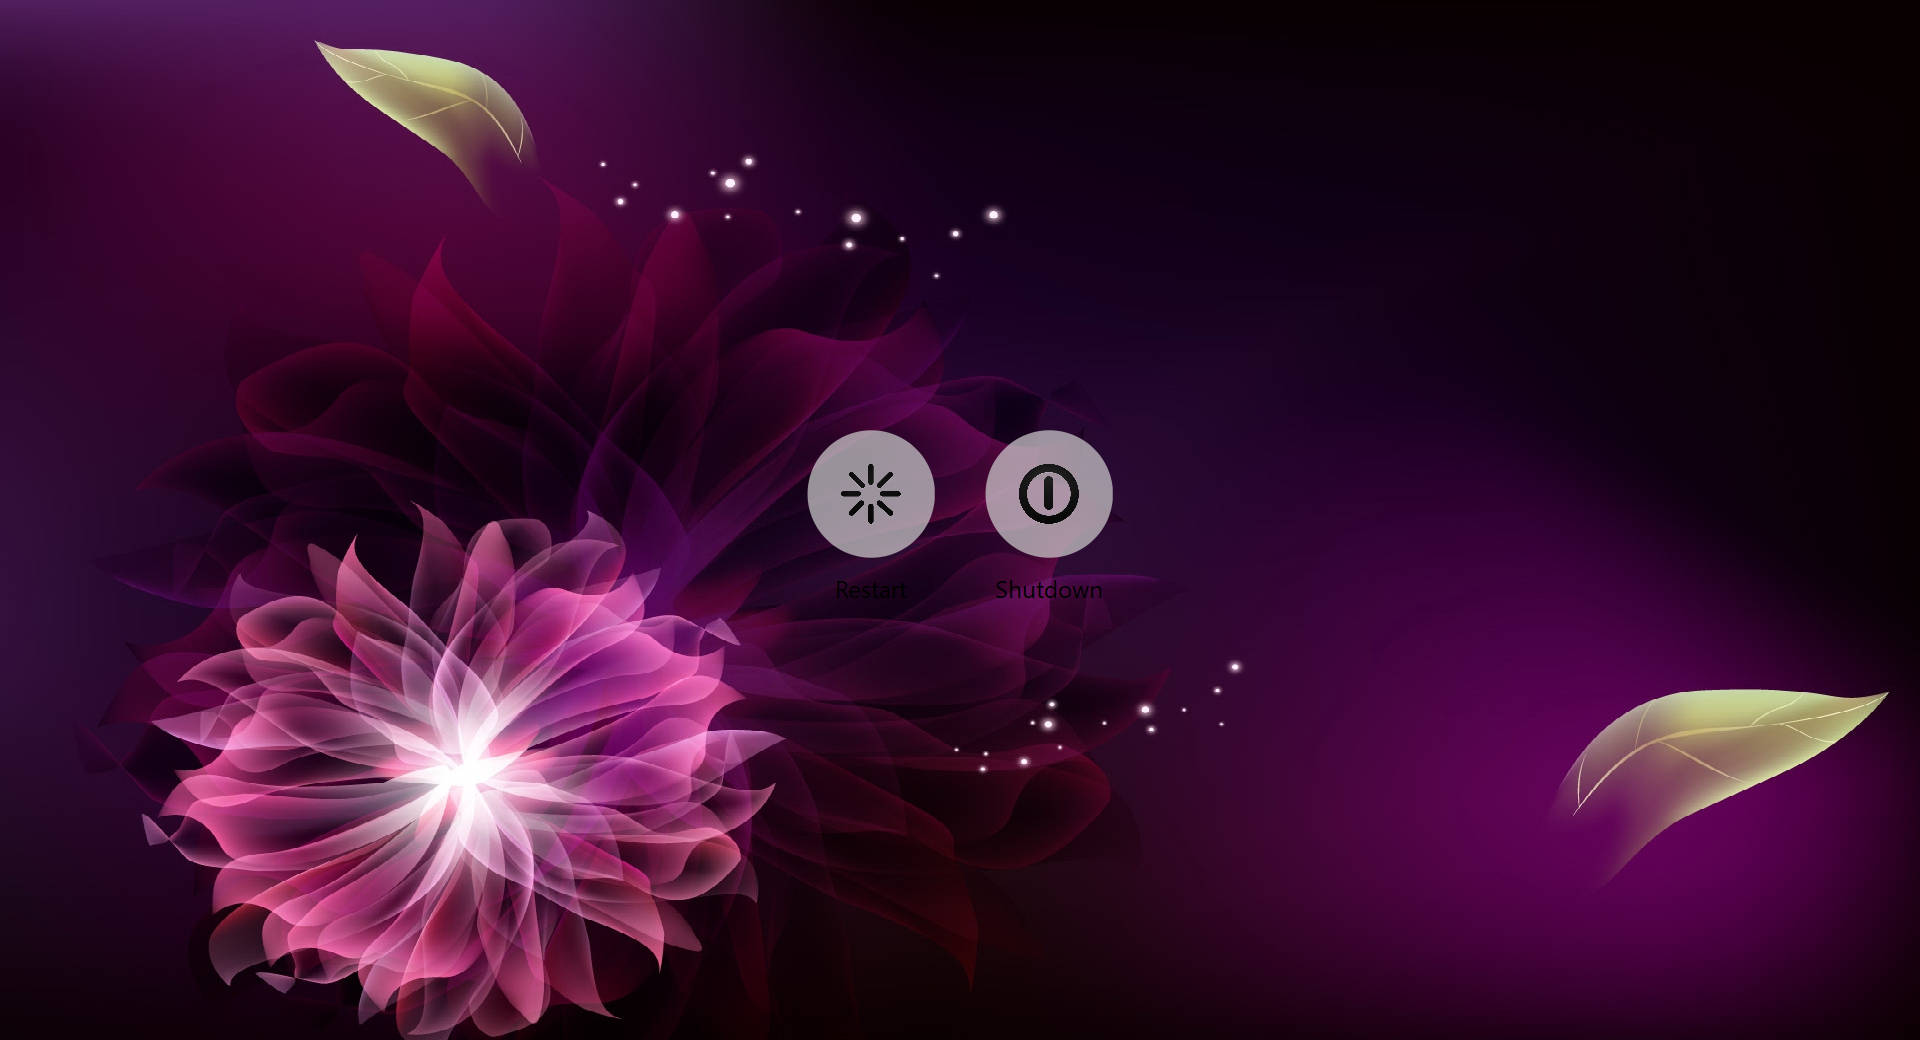 Win10XPE_x64_Chum_190520_0012.jpg